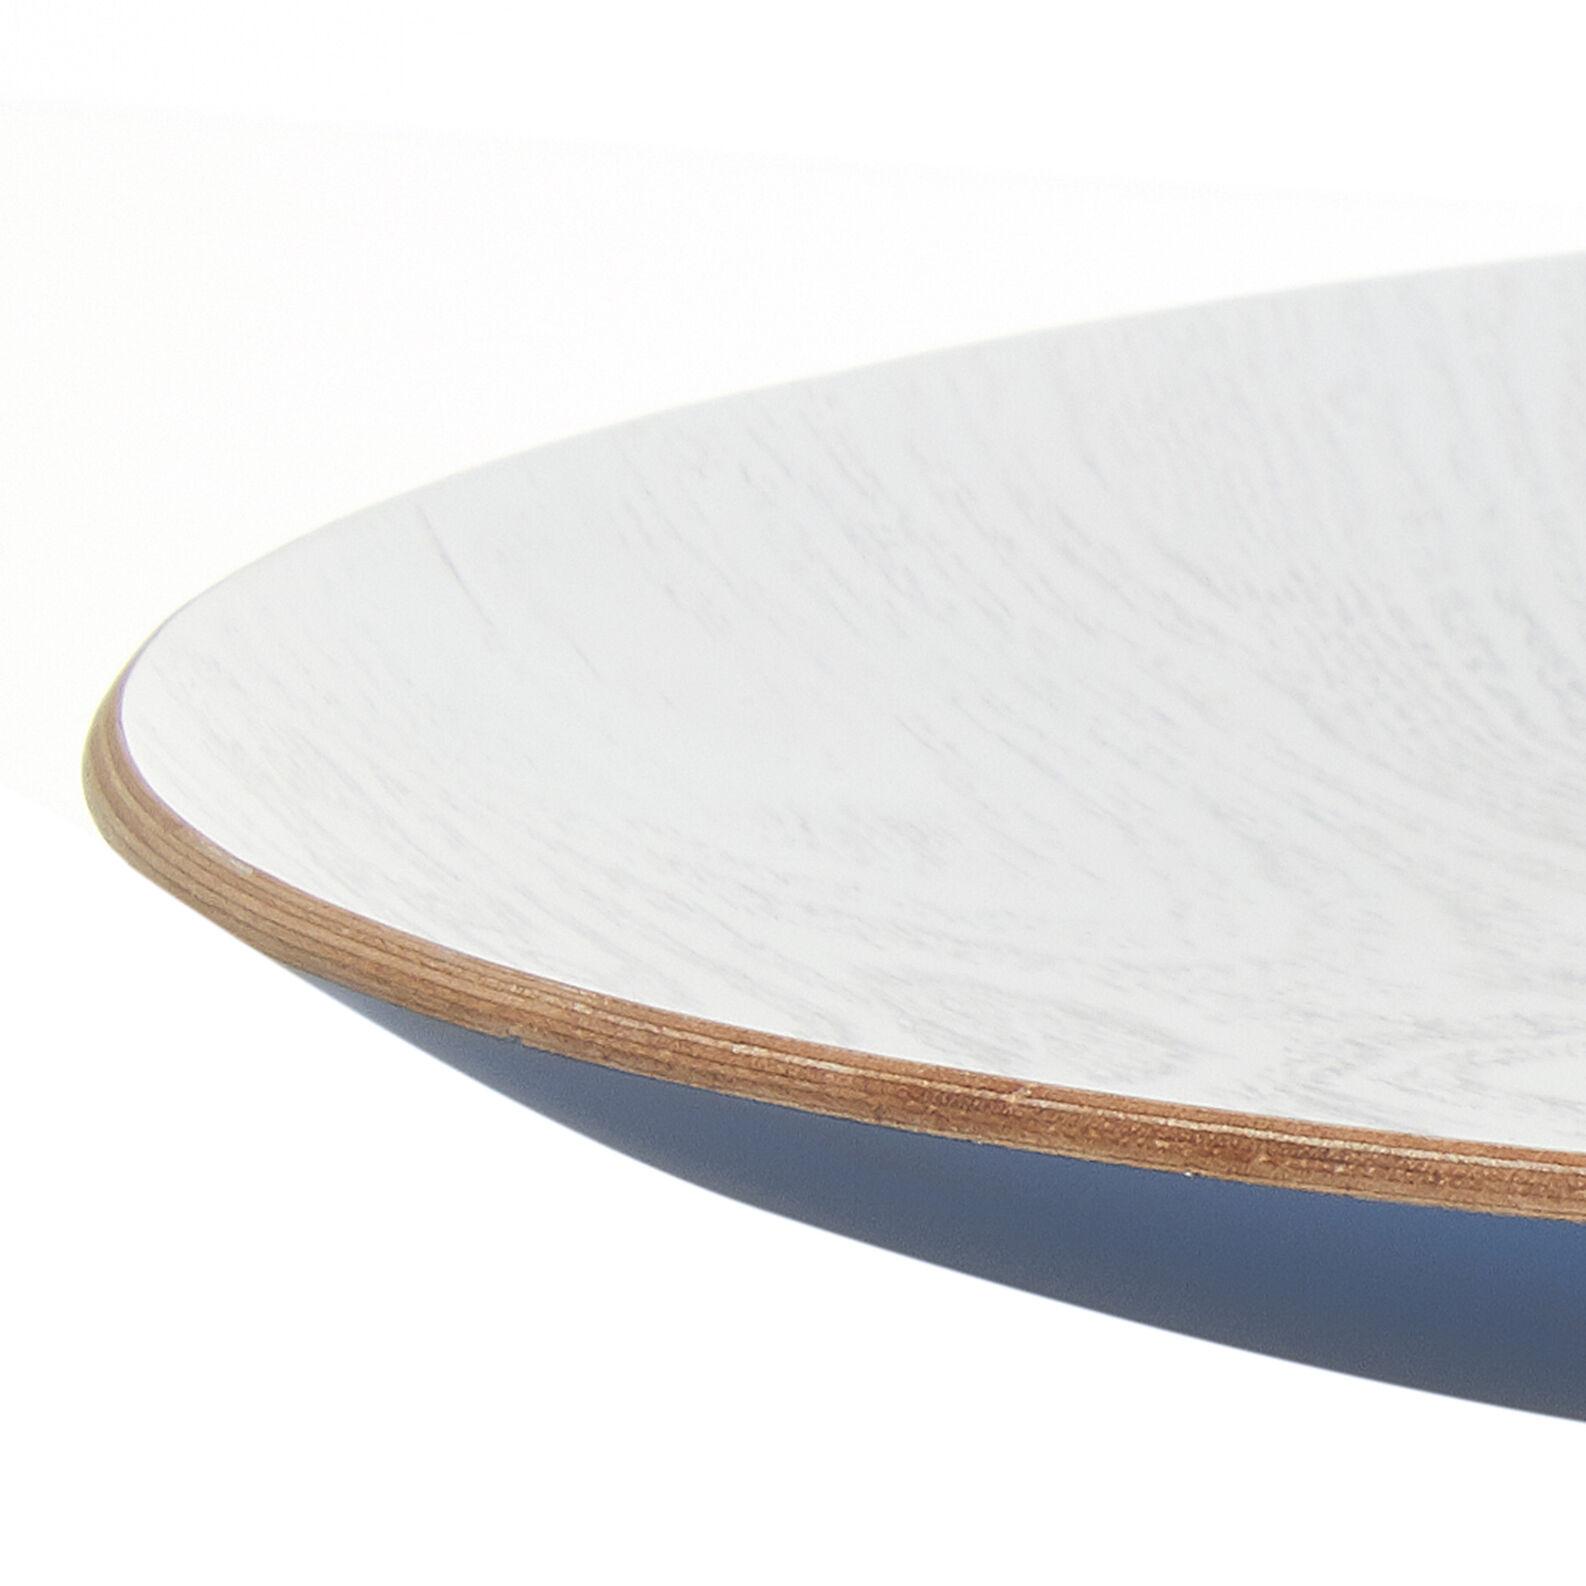 Centrotavola legno di salice dipinto